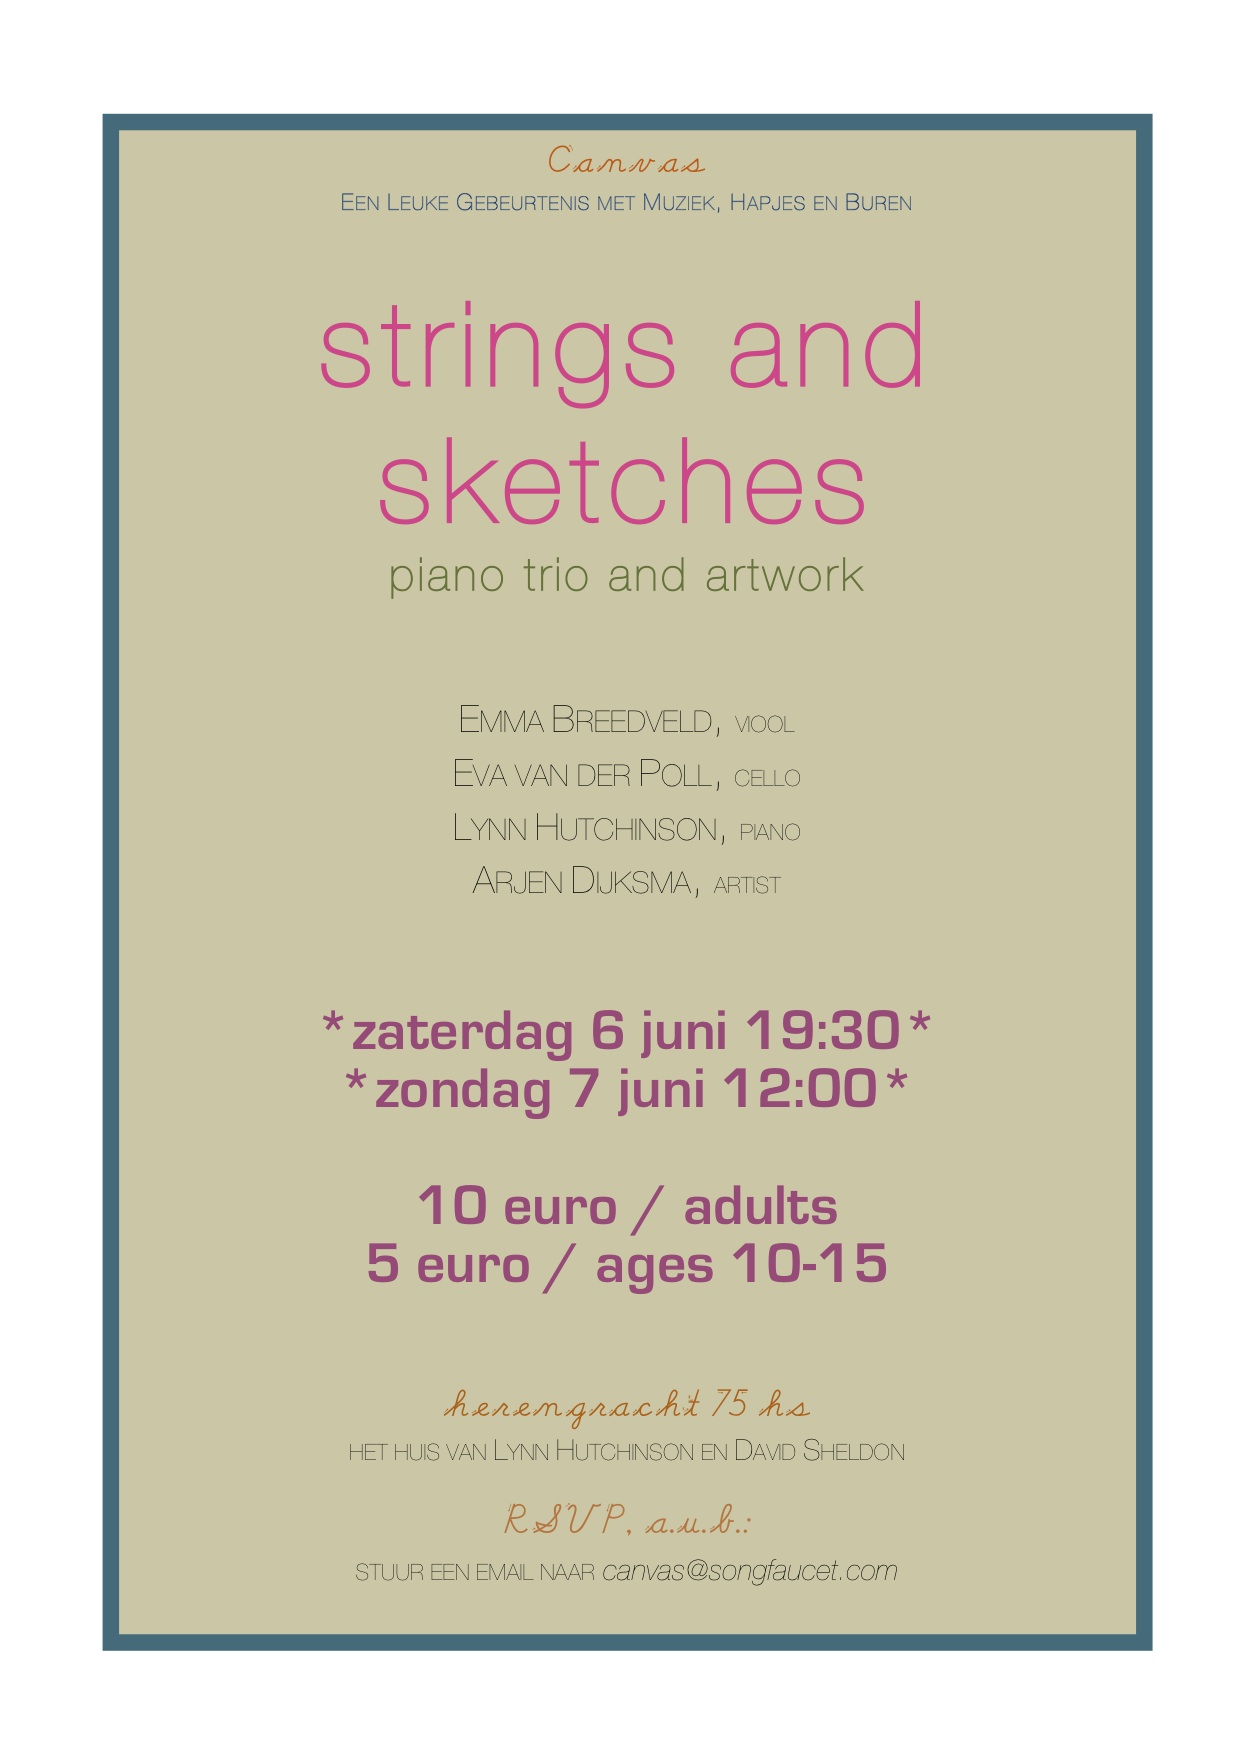 Canvas Invitation June 09.jpg